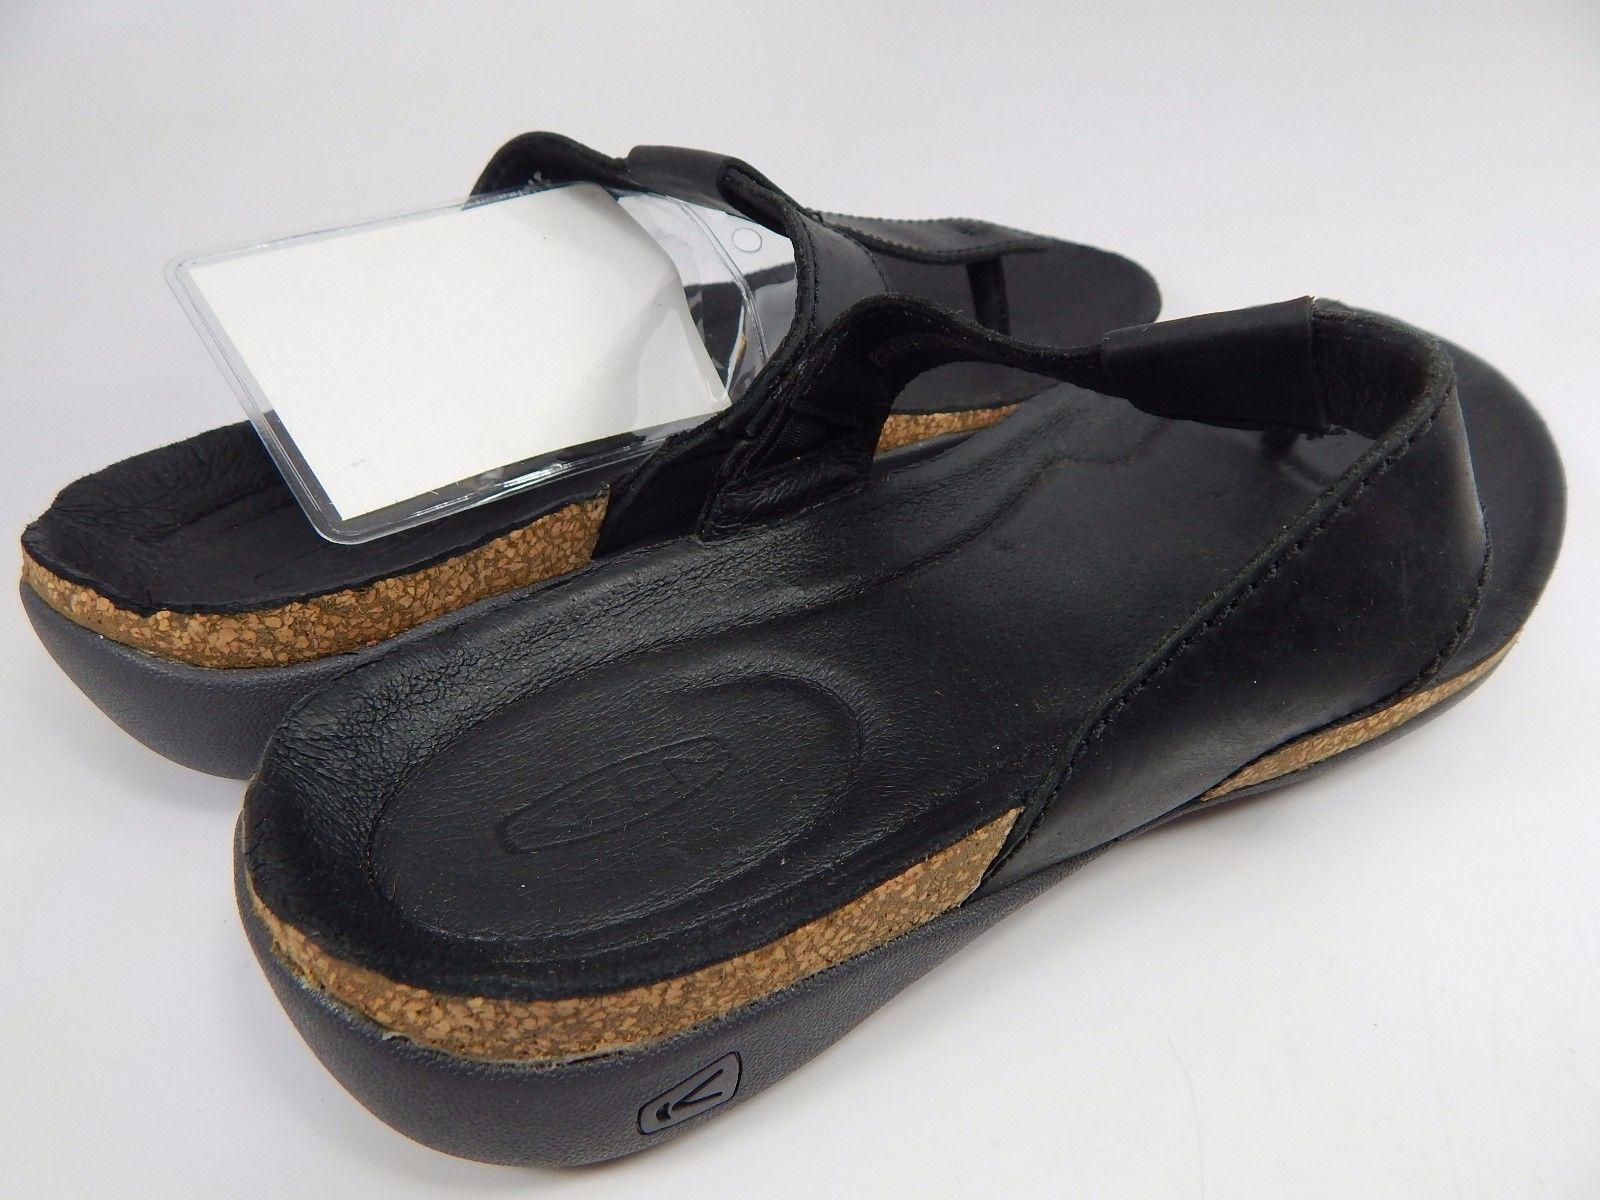 Keen Dauntless Women's Flip Flops Size US 7 M (B) EU 37.5 Black